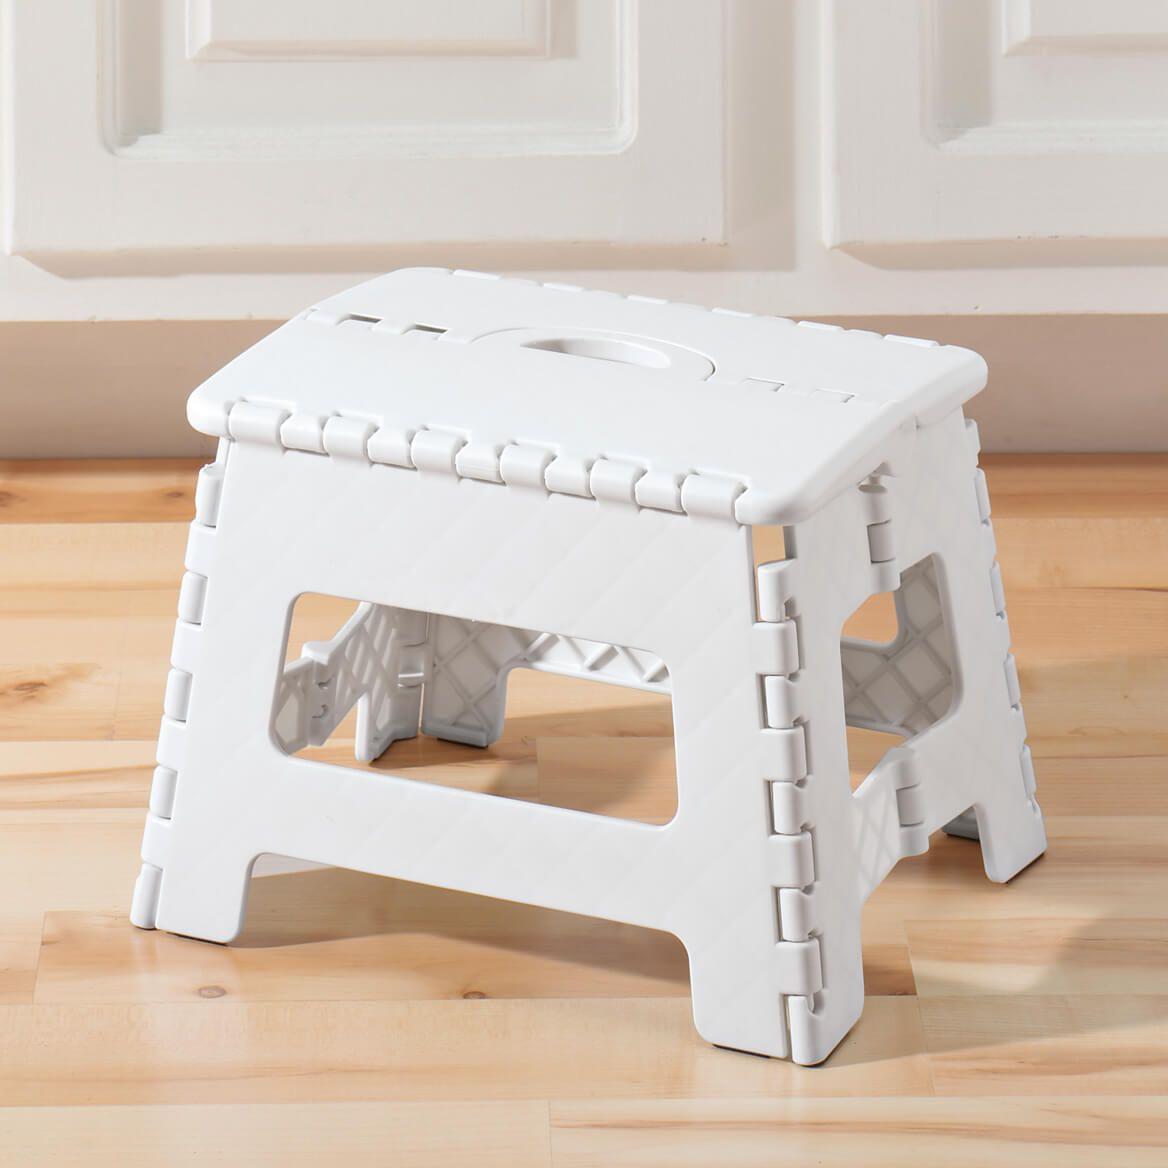 Folding Step Stool-311826